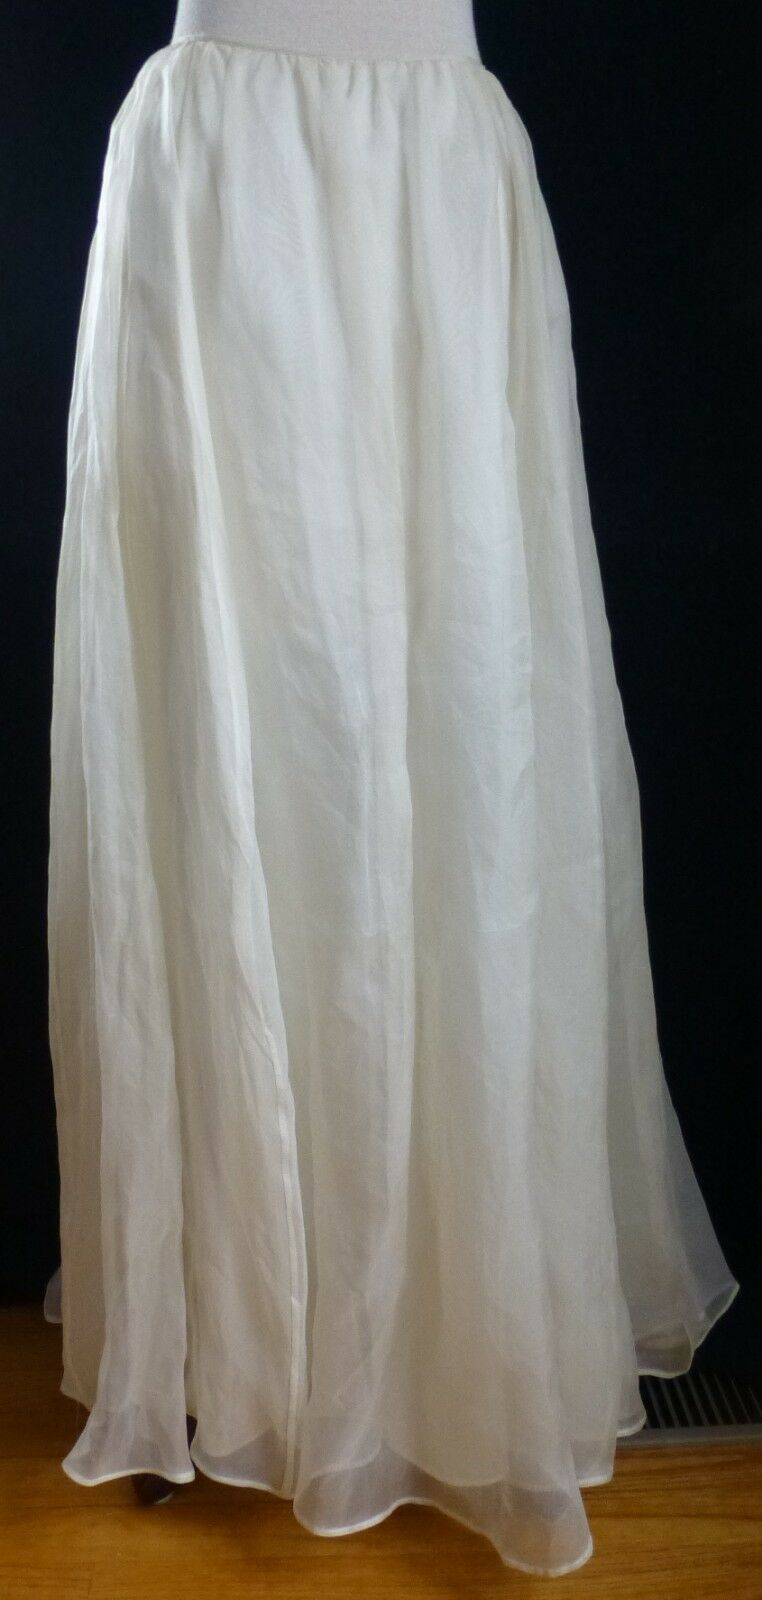 Shelli Segal Neiman Marcus Long Silk Maxi kjol Cream gul Woherrar Storlek 8 NWT